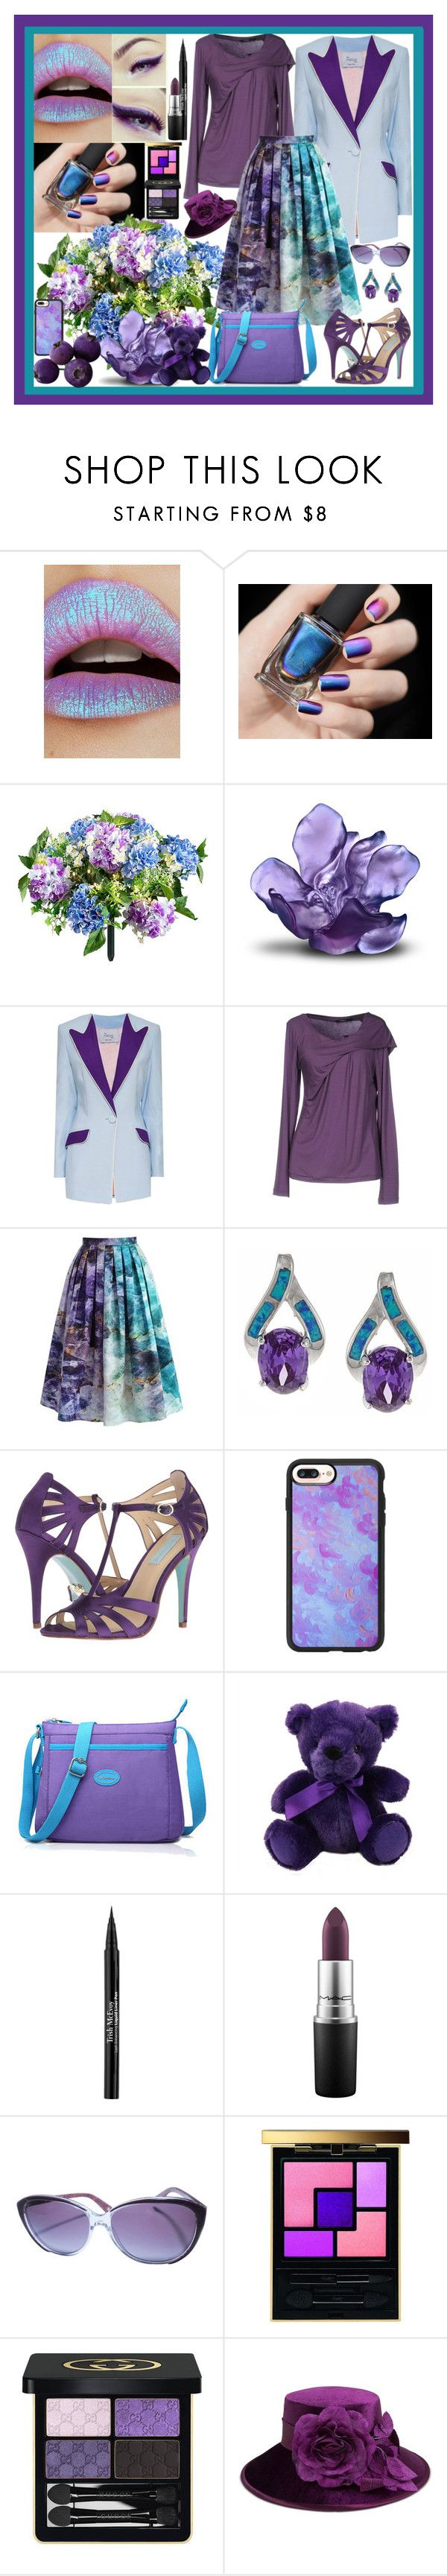 """Blue & Purple"" by fantasiegirl ❤ liked on Polyvore featuring Lime Crime, Improvements, Daum, Hebe Studio, Blue Les Copains, Chicwish, La Preciosa, Betsey Johnson, Casetify and Trish McEvoy"